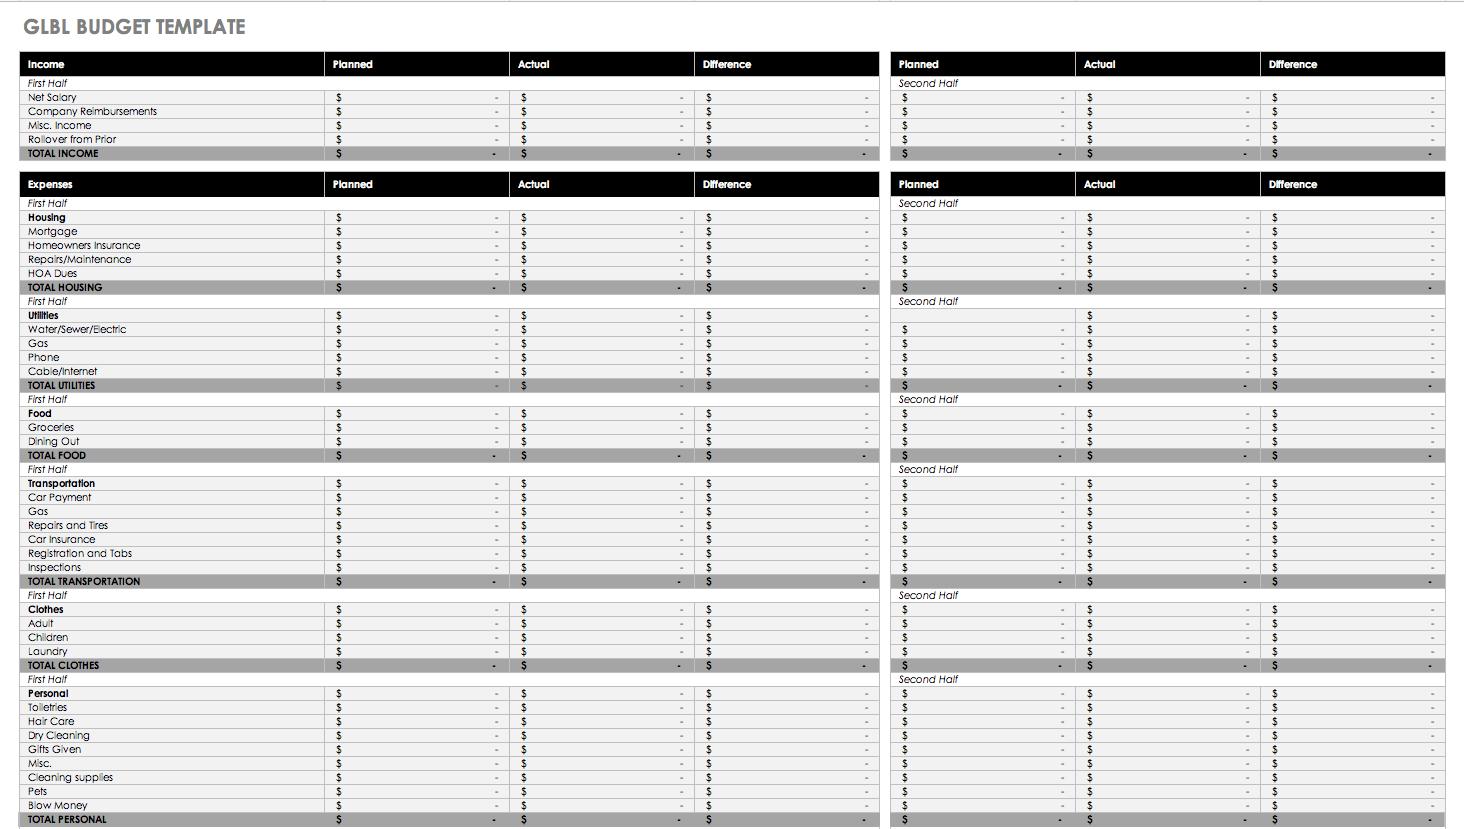 Zero Based Budget Spreadsheet 2 Spreadsheet Downloa Zero